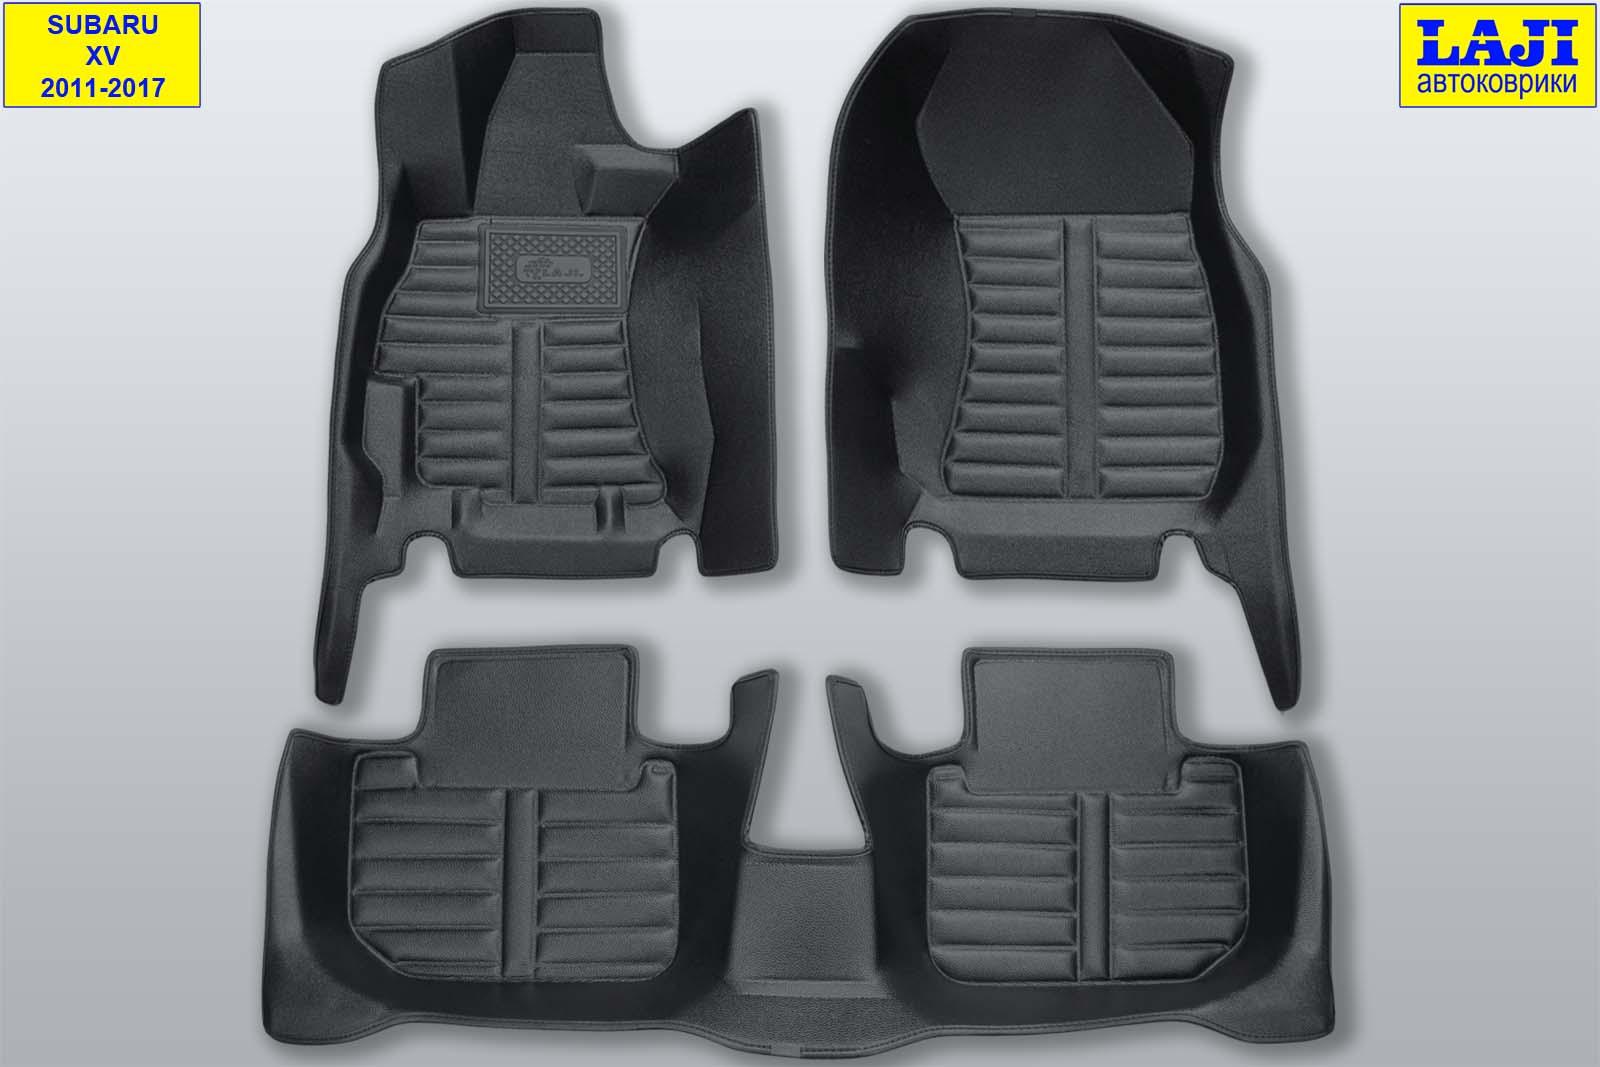 5D коврики в салон Subaru XV 2011-2017 1